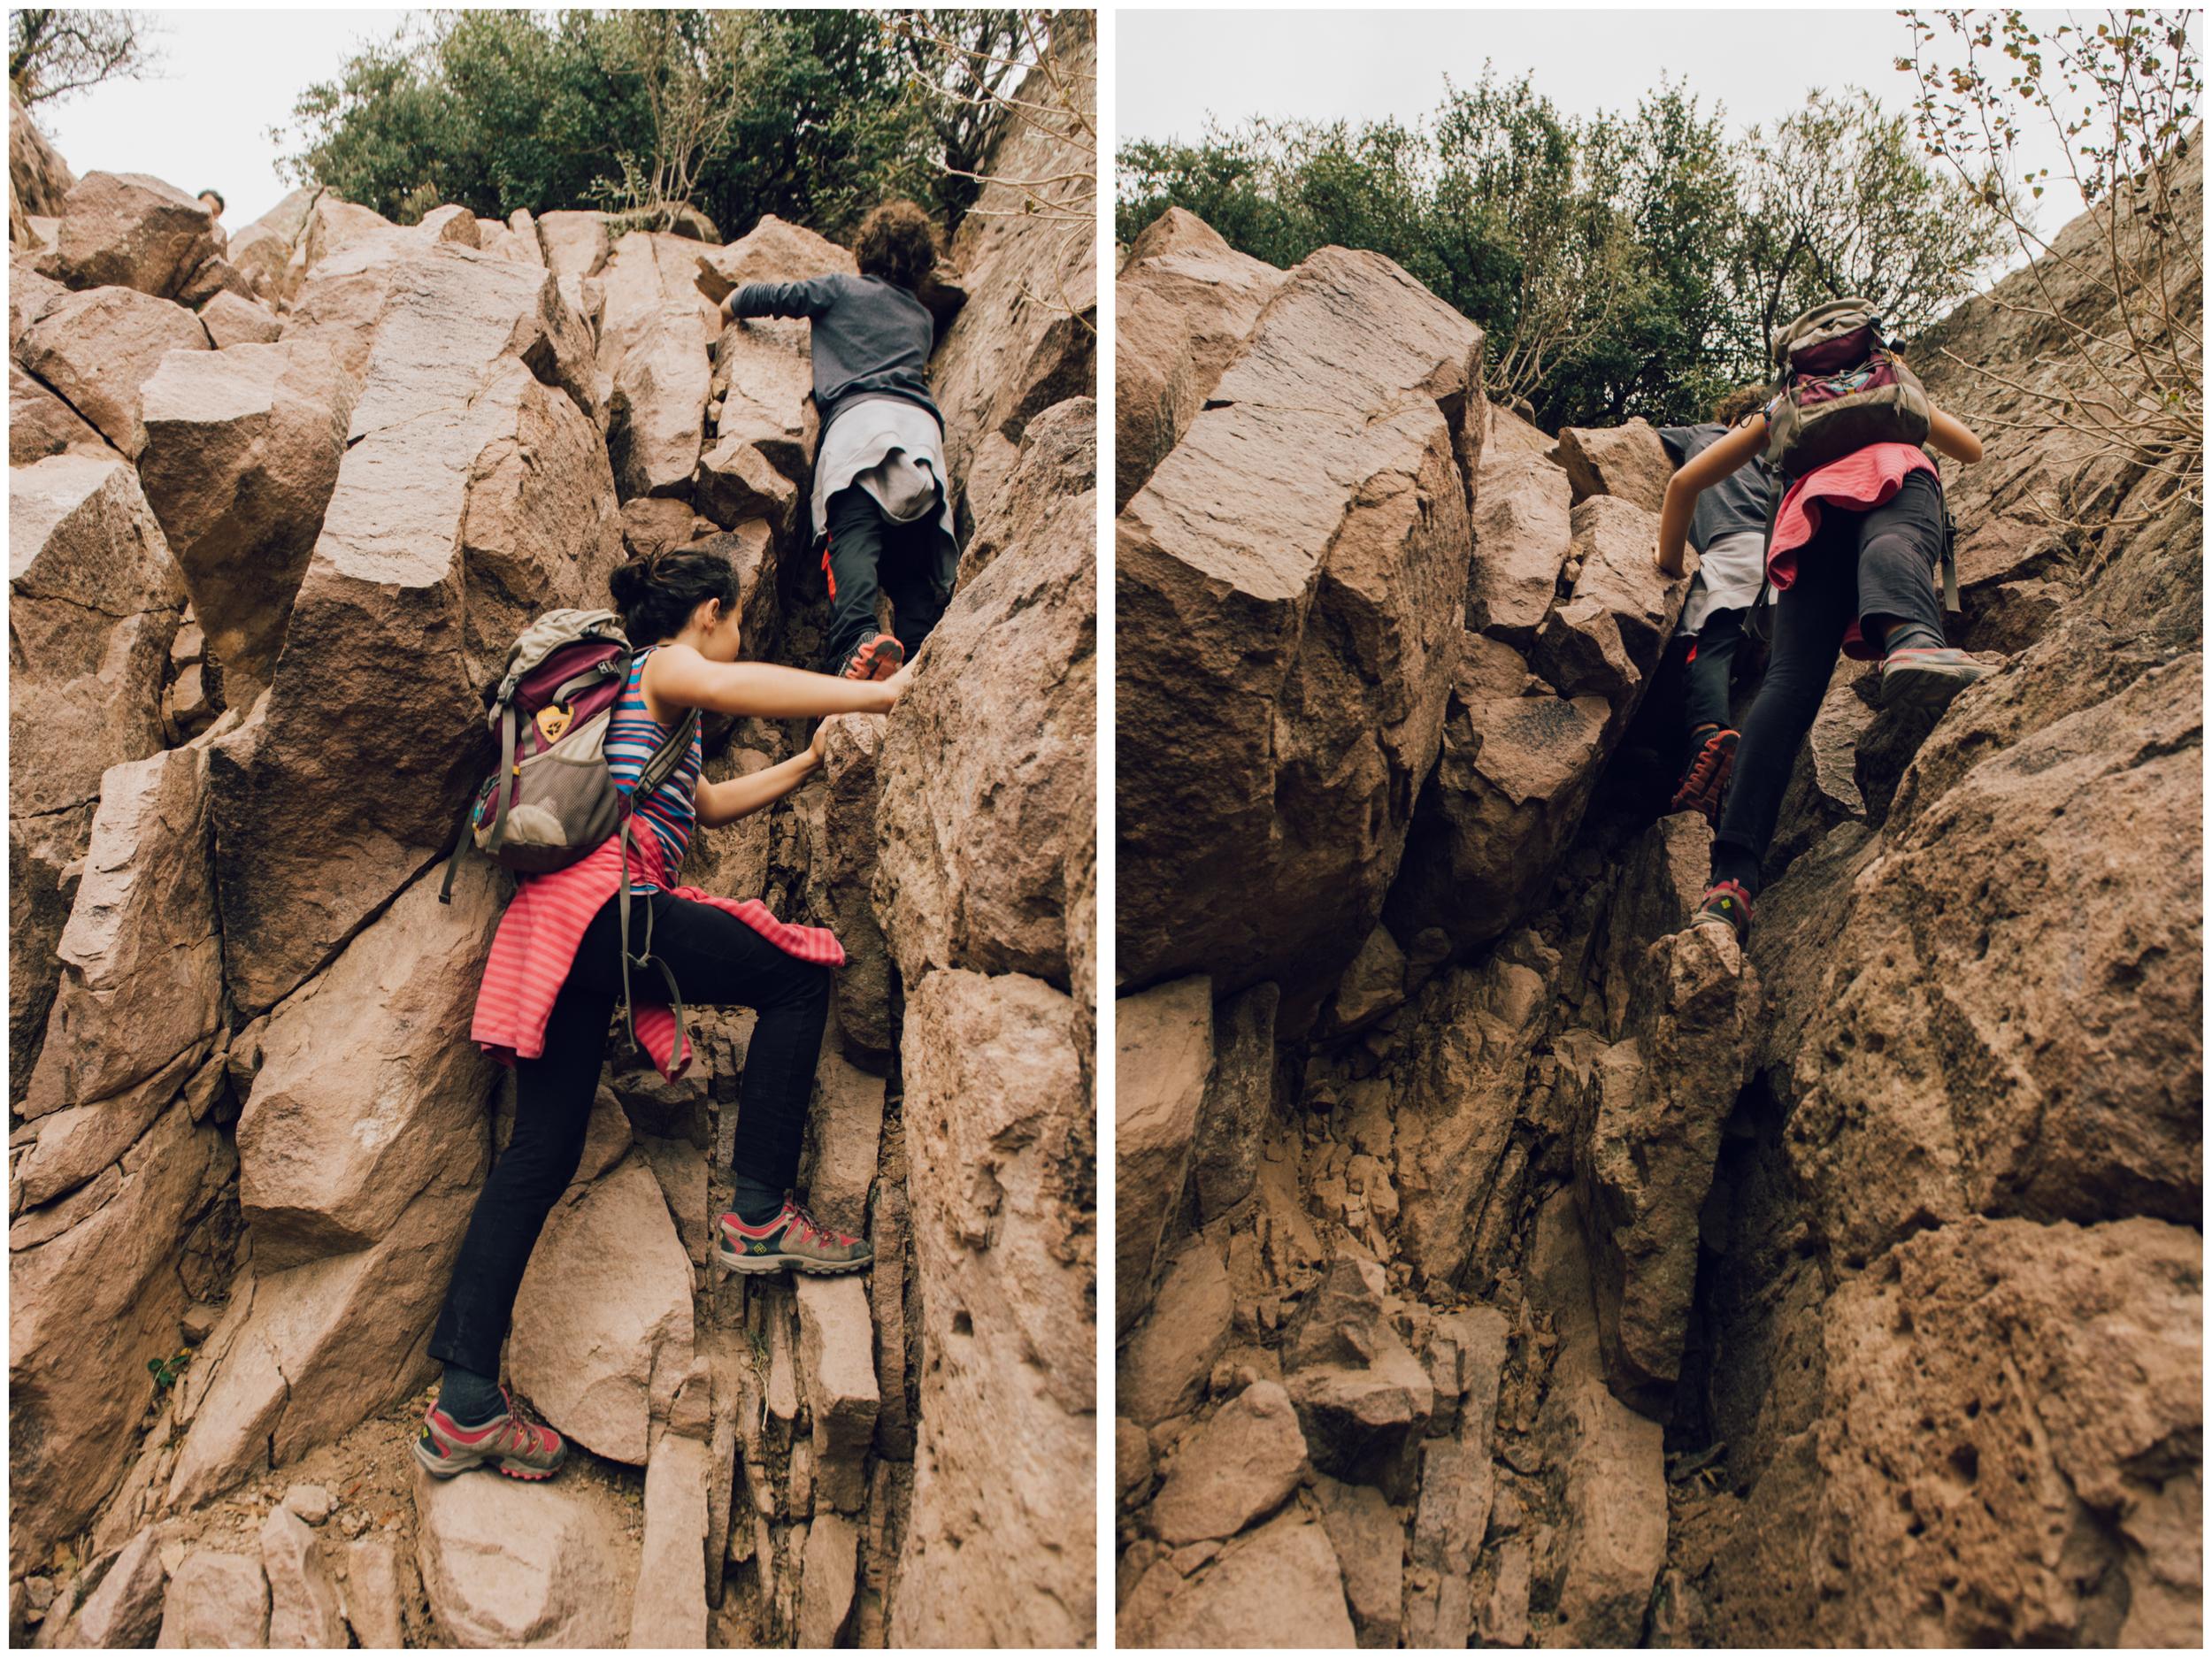 Last push before the summit... An 10 feet high rock wall!